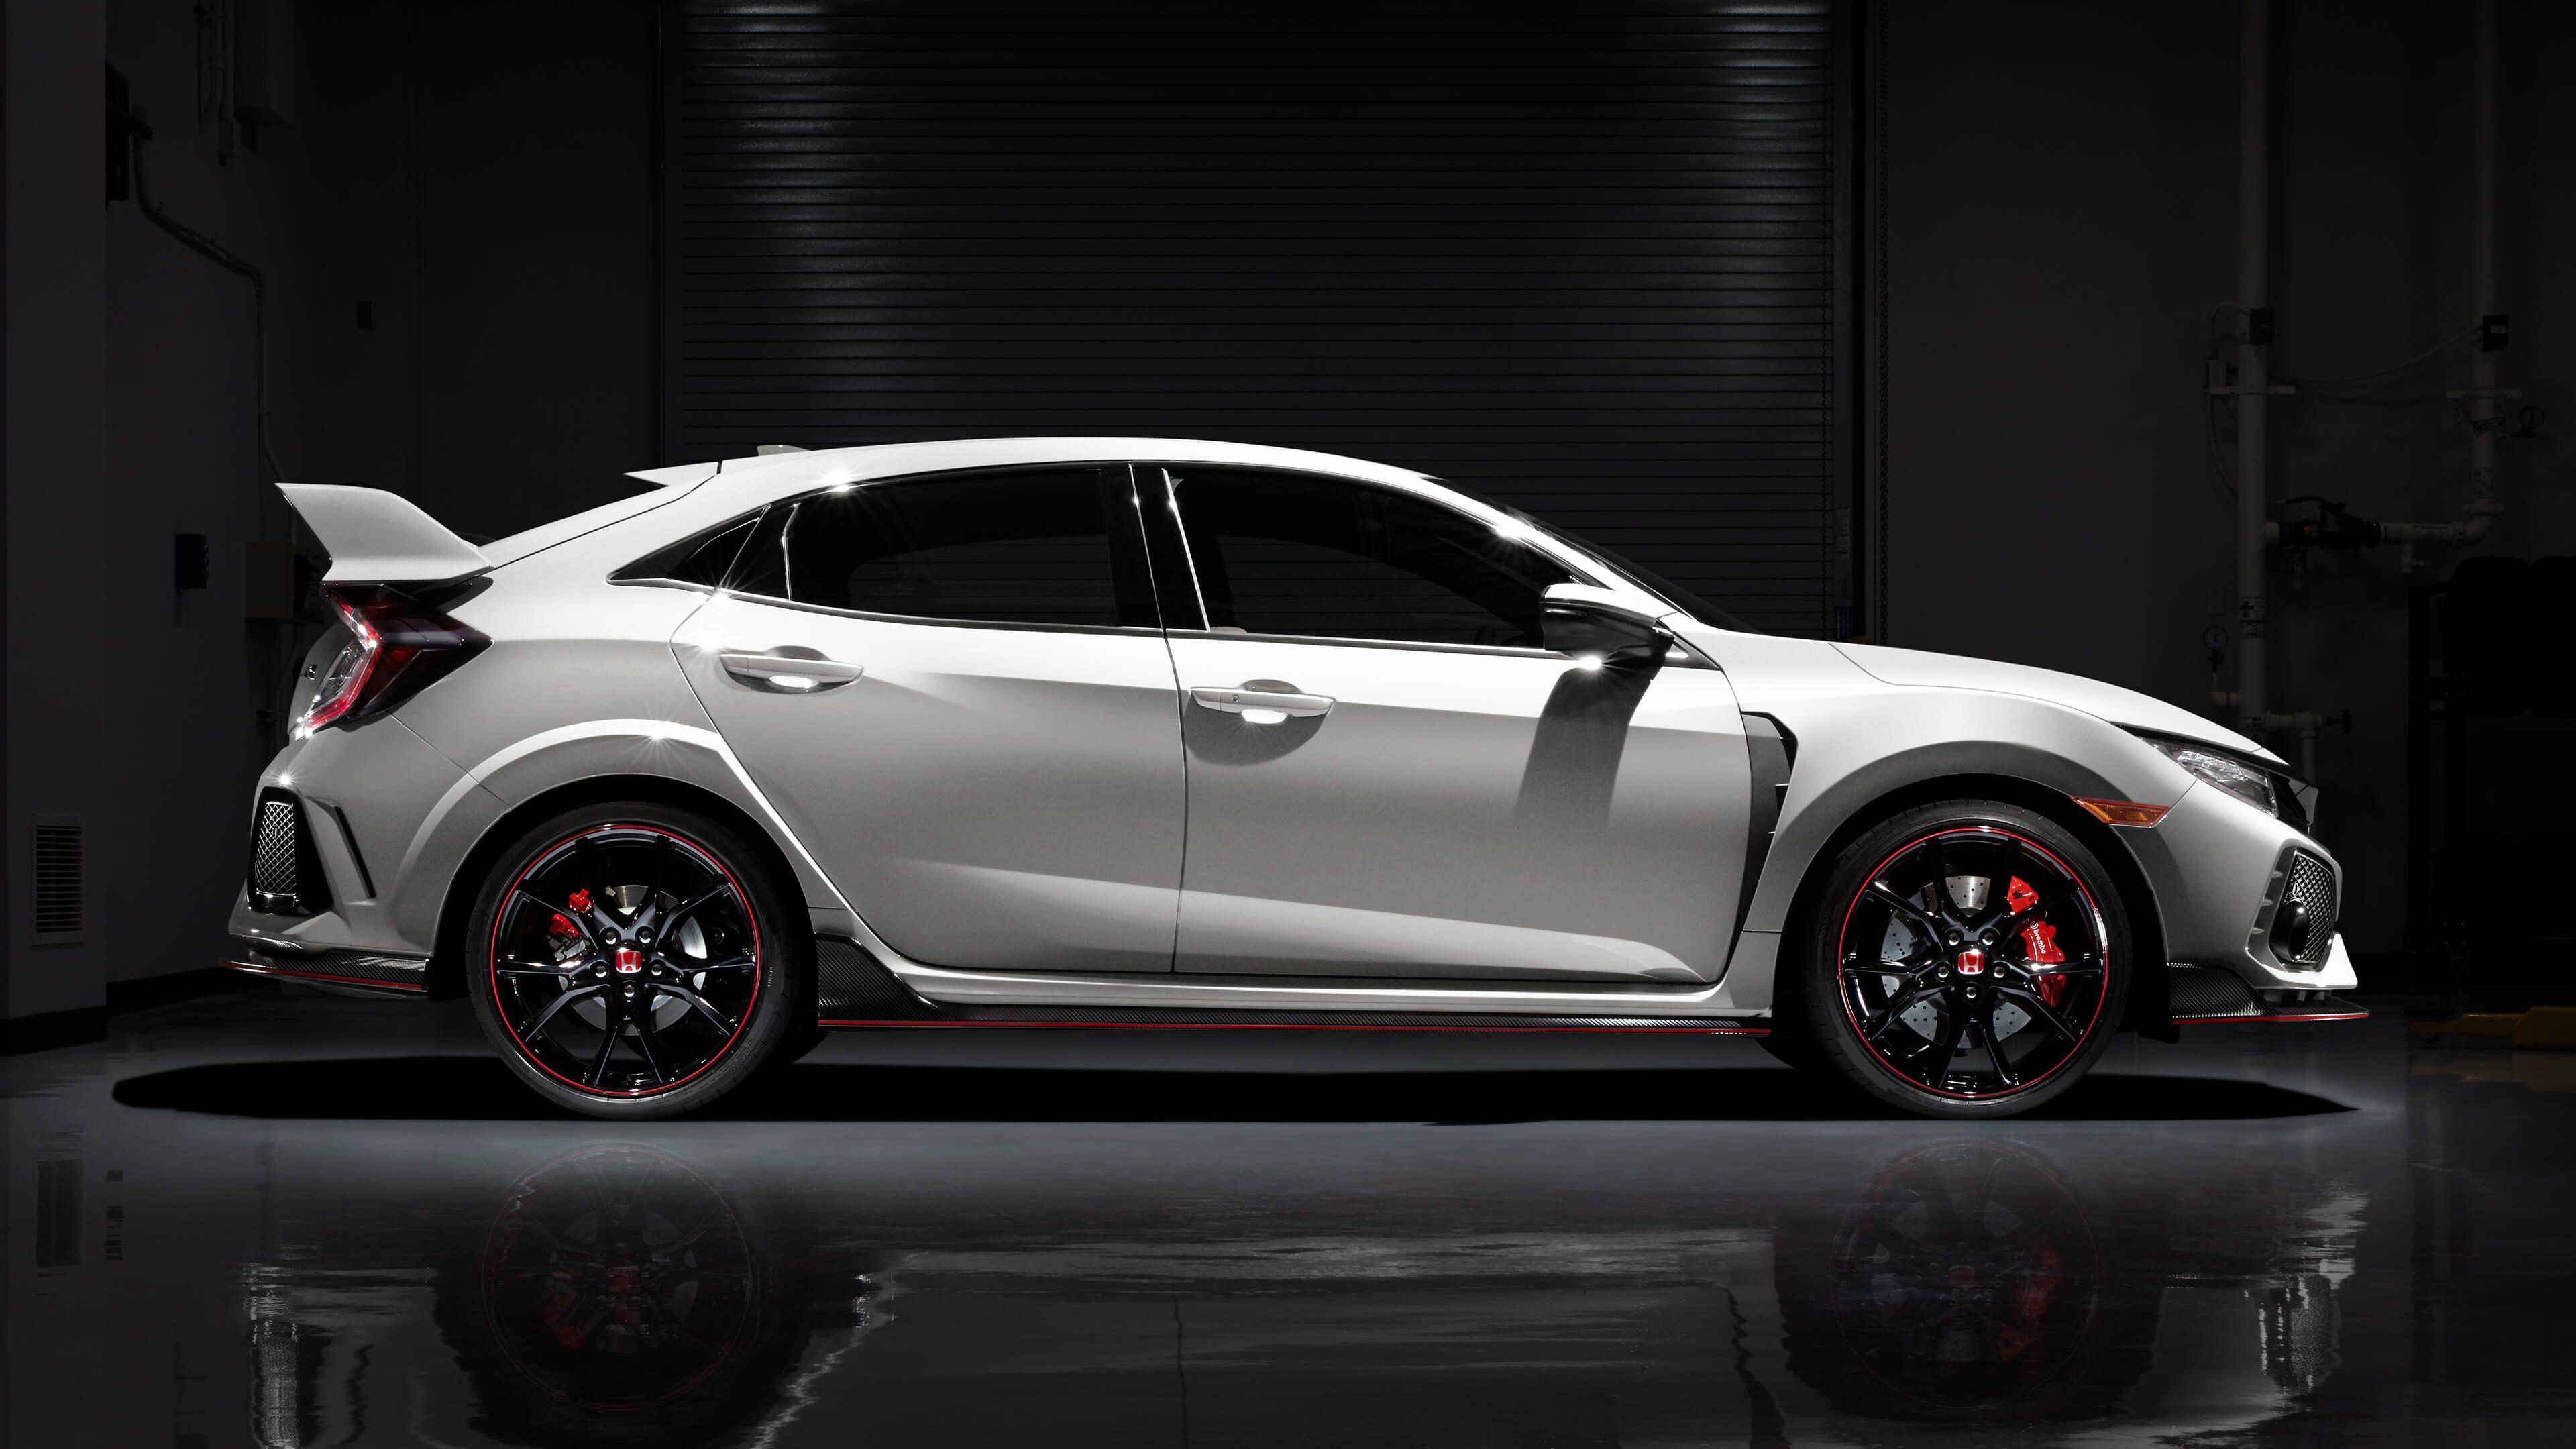 Meet The Most Powerful Honda Civic Yet The 2018 Honda Civic Type R